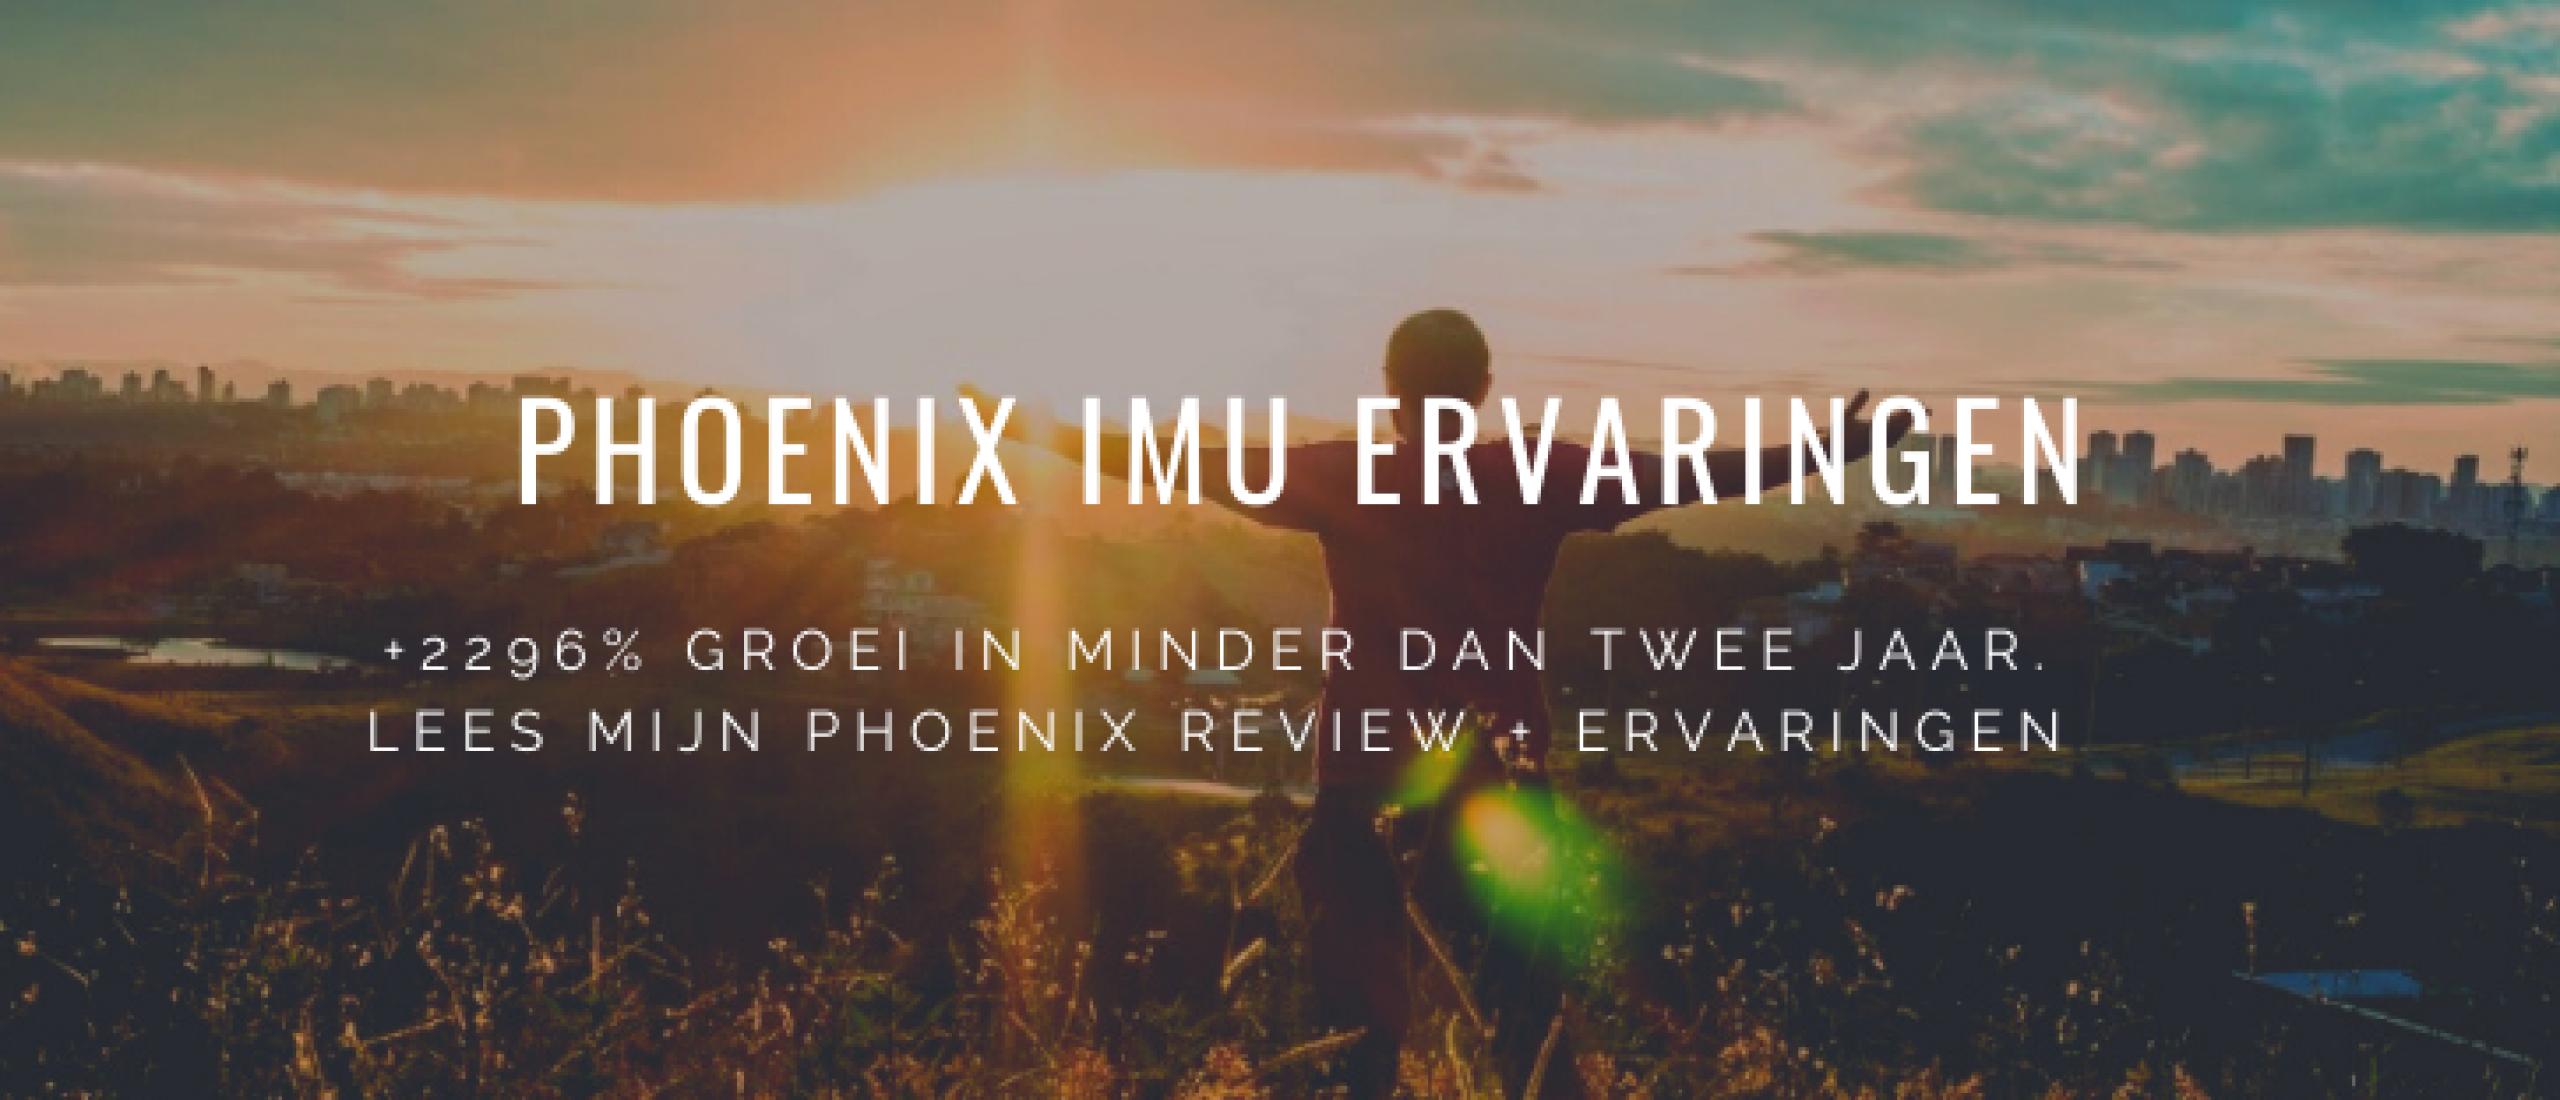 phoenix-software-review